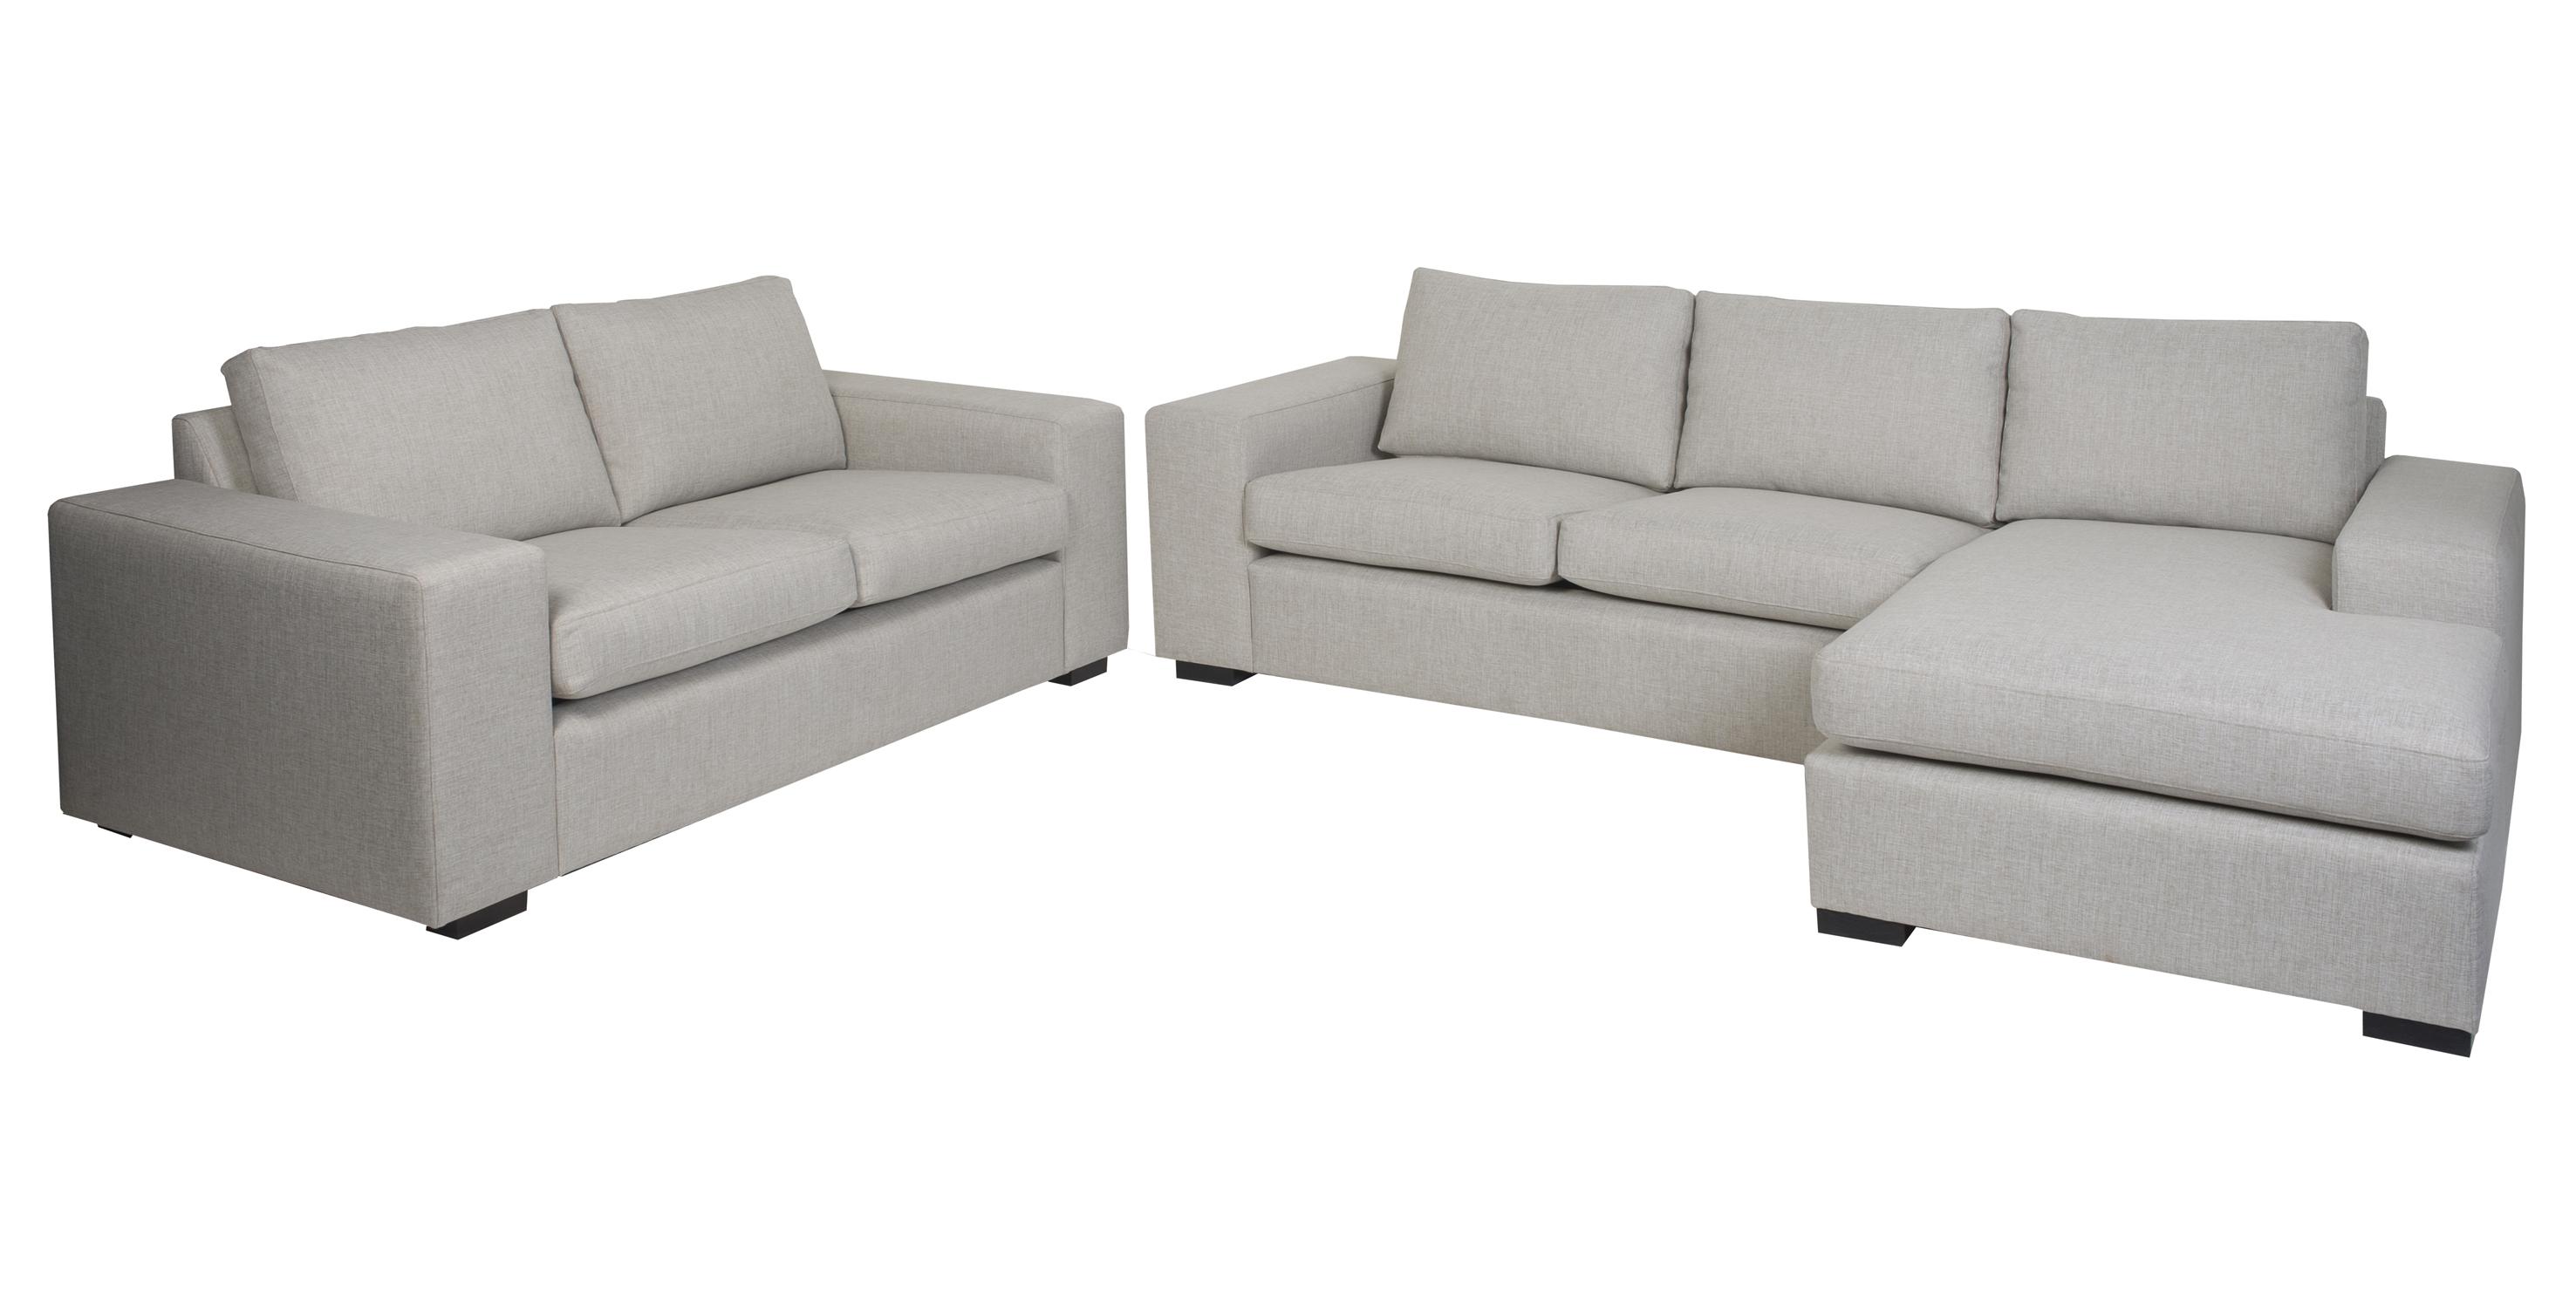 Quality Lounges Sofa BedsKnown For Sydney Affordable lJ3F1uK5Tc